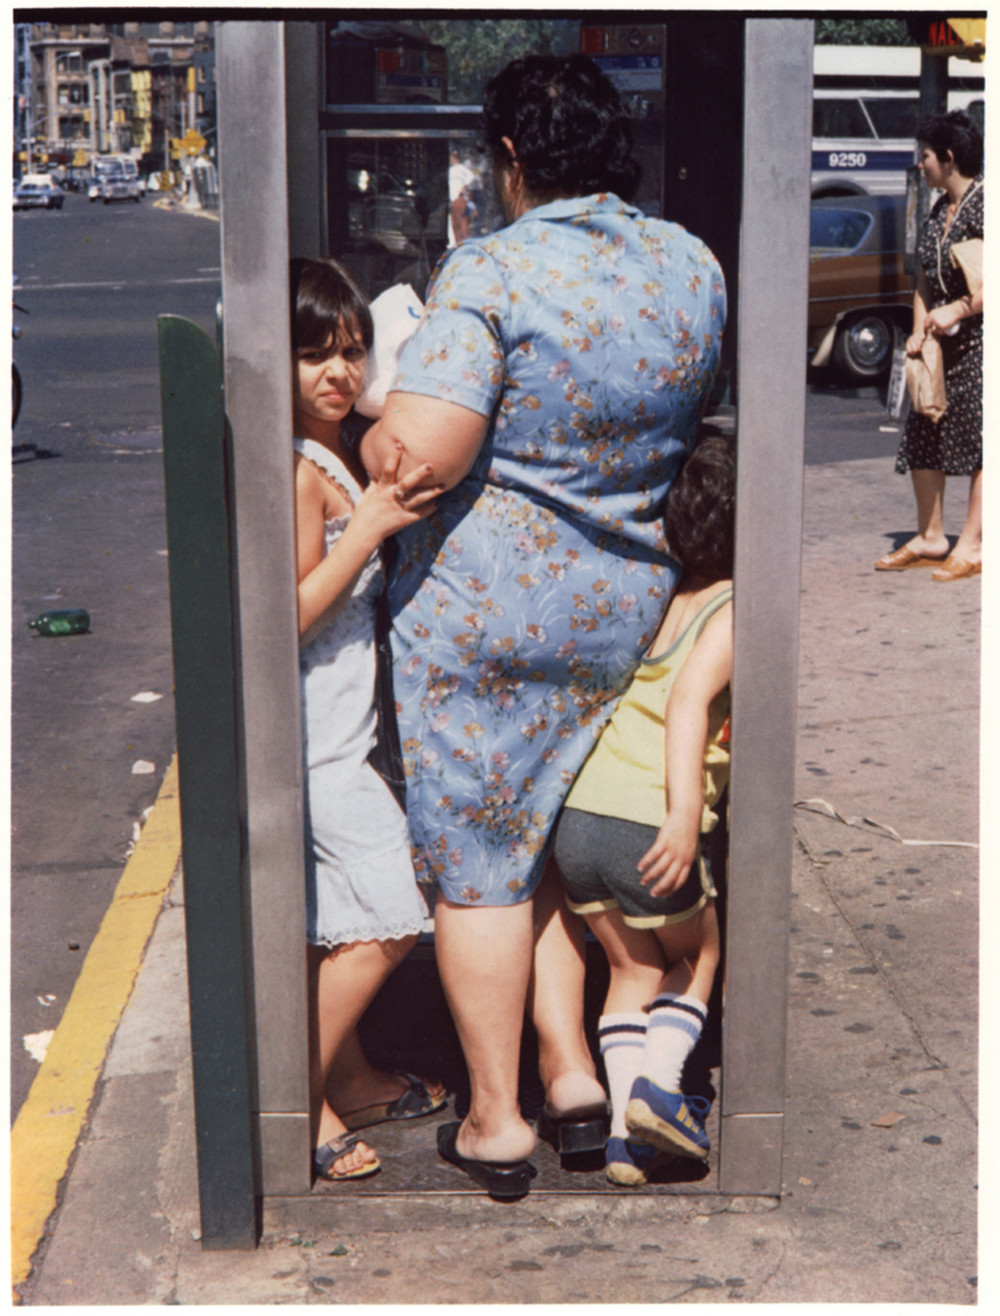 Уличная жизнь Нью_Йорка с 1930_х до 80_х годов в фотографиях Элен Левитт 1